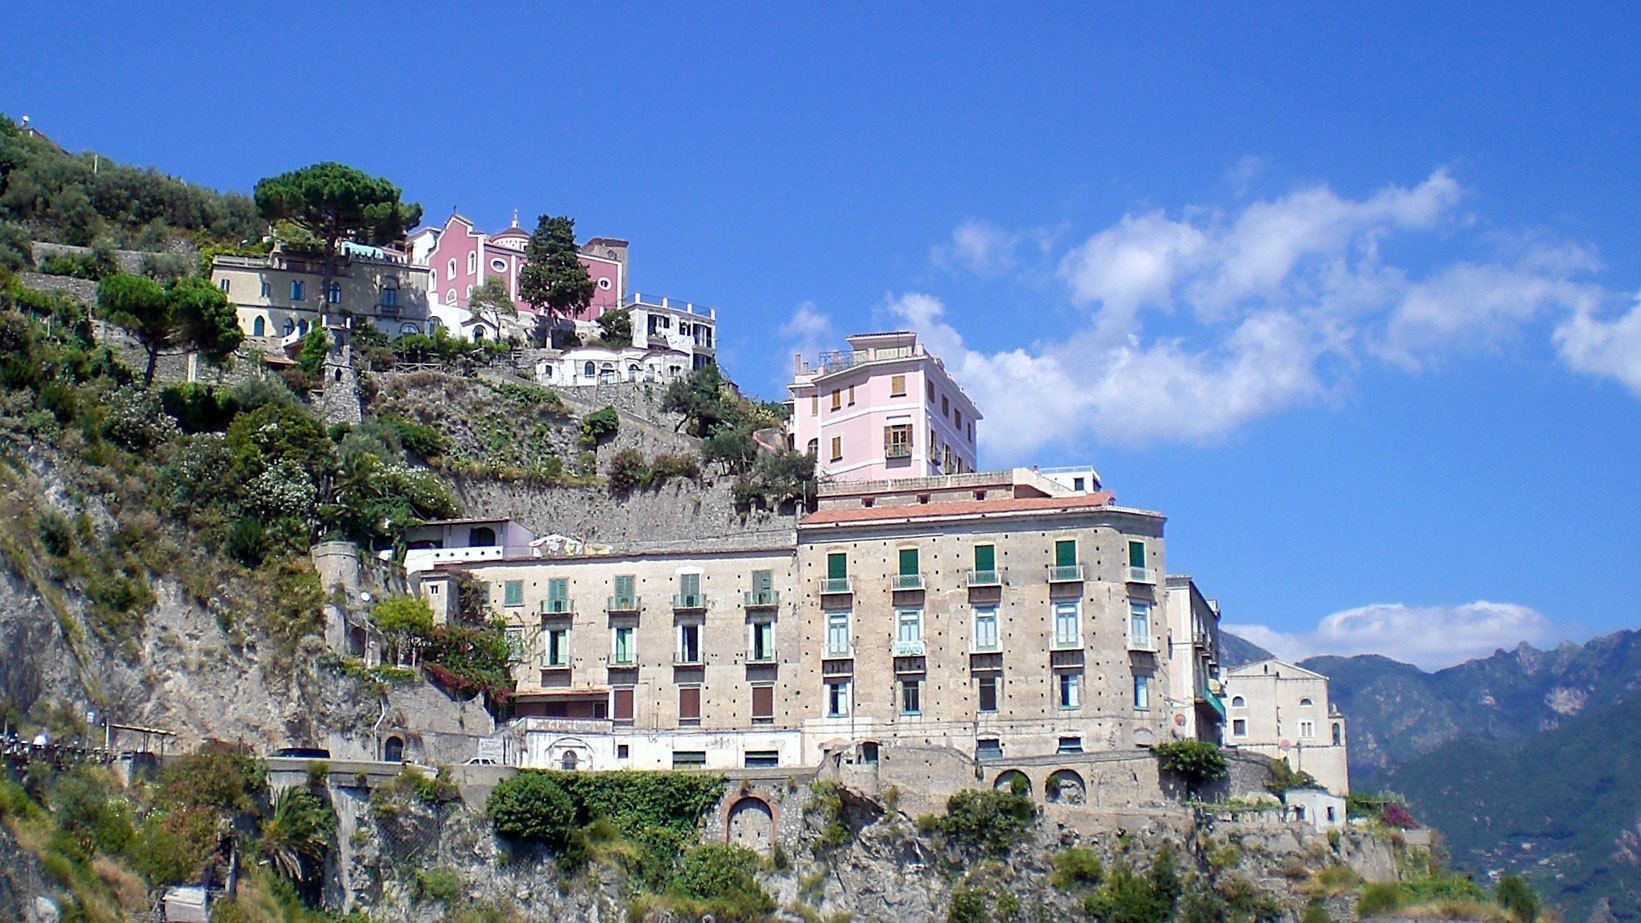 buildings on the amalfi